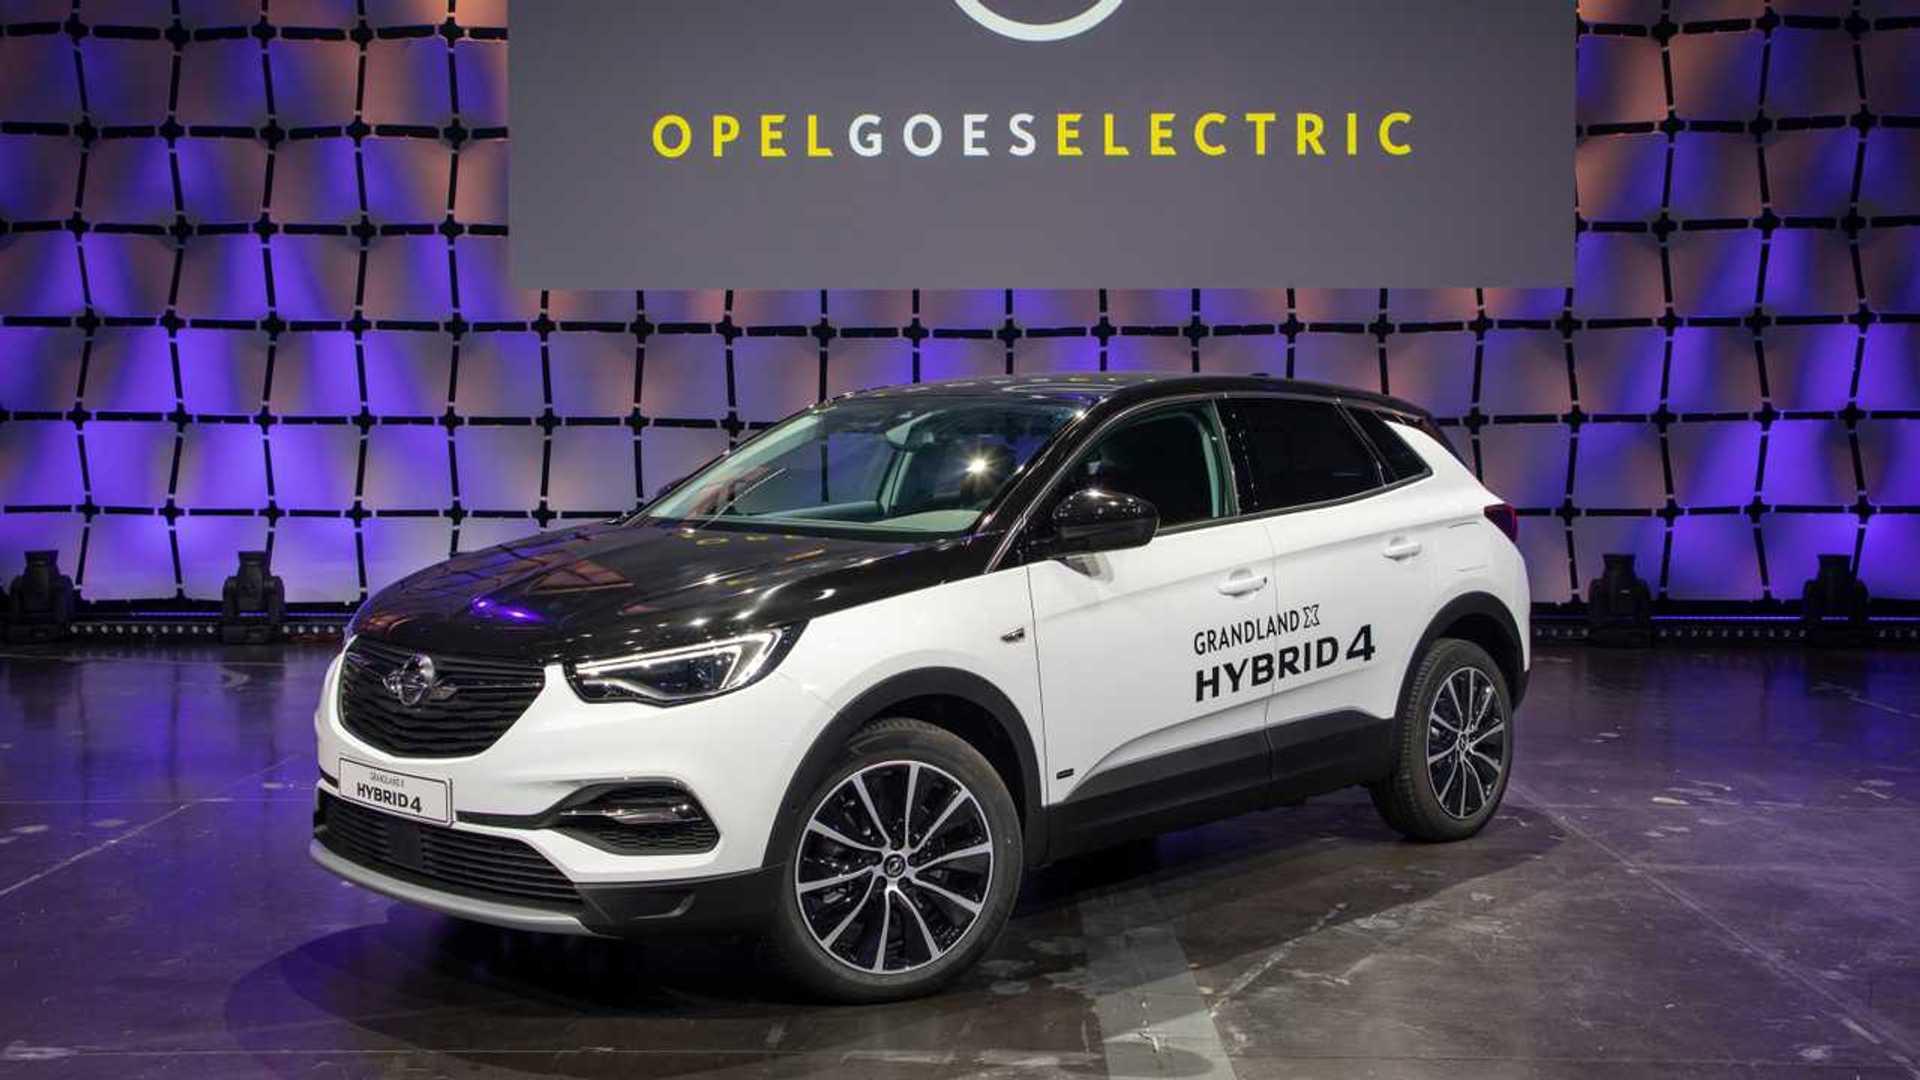 2019 Opel Grandland X Hybrid4 Release Date >> Opel Grandland X Hybrid4 Priced From 49 940 In Germany